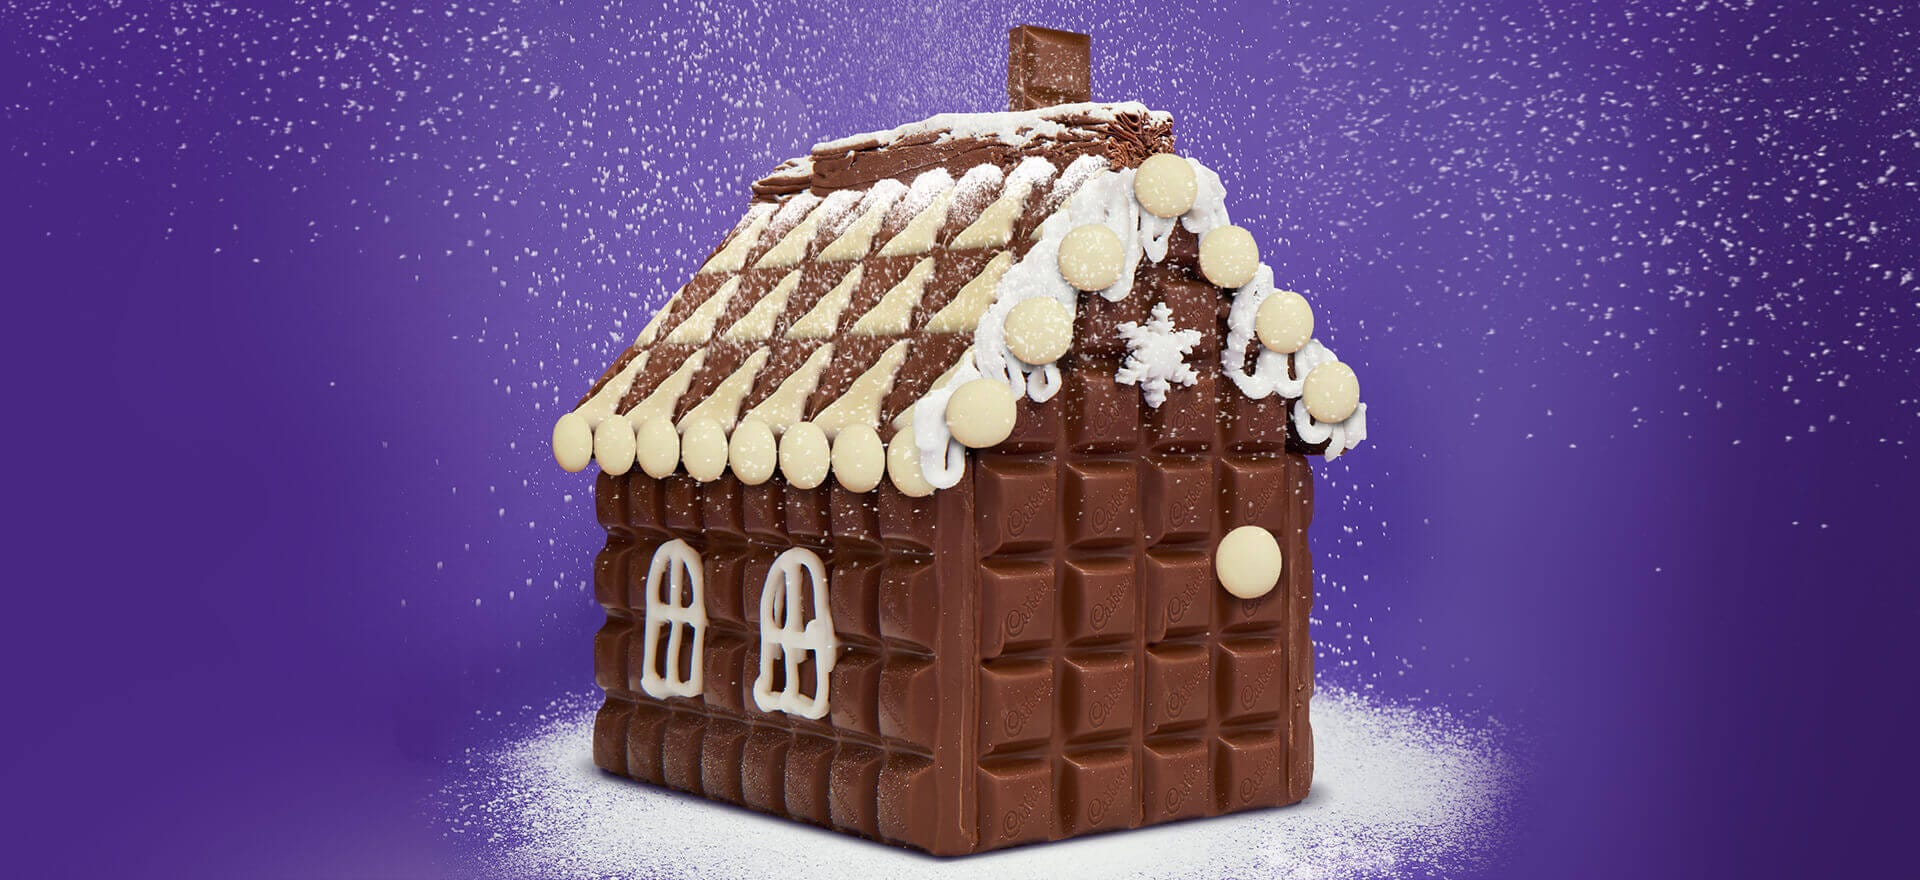 Christmas Chocolate Cottage